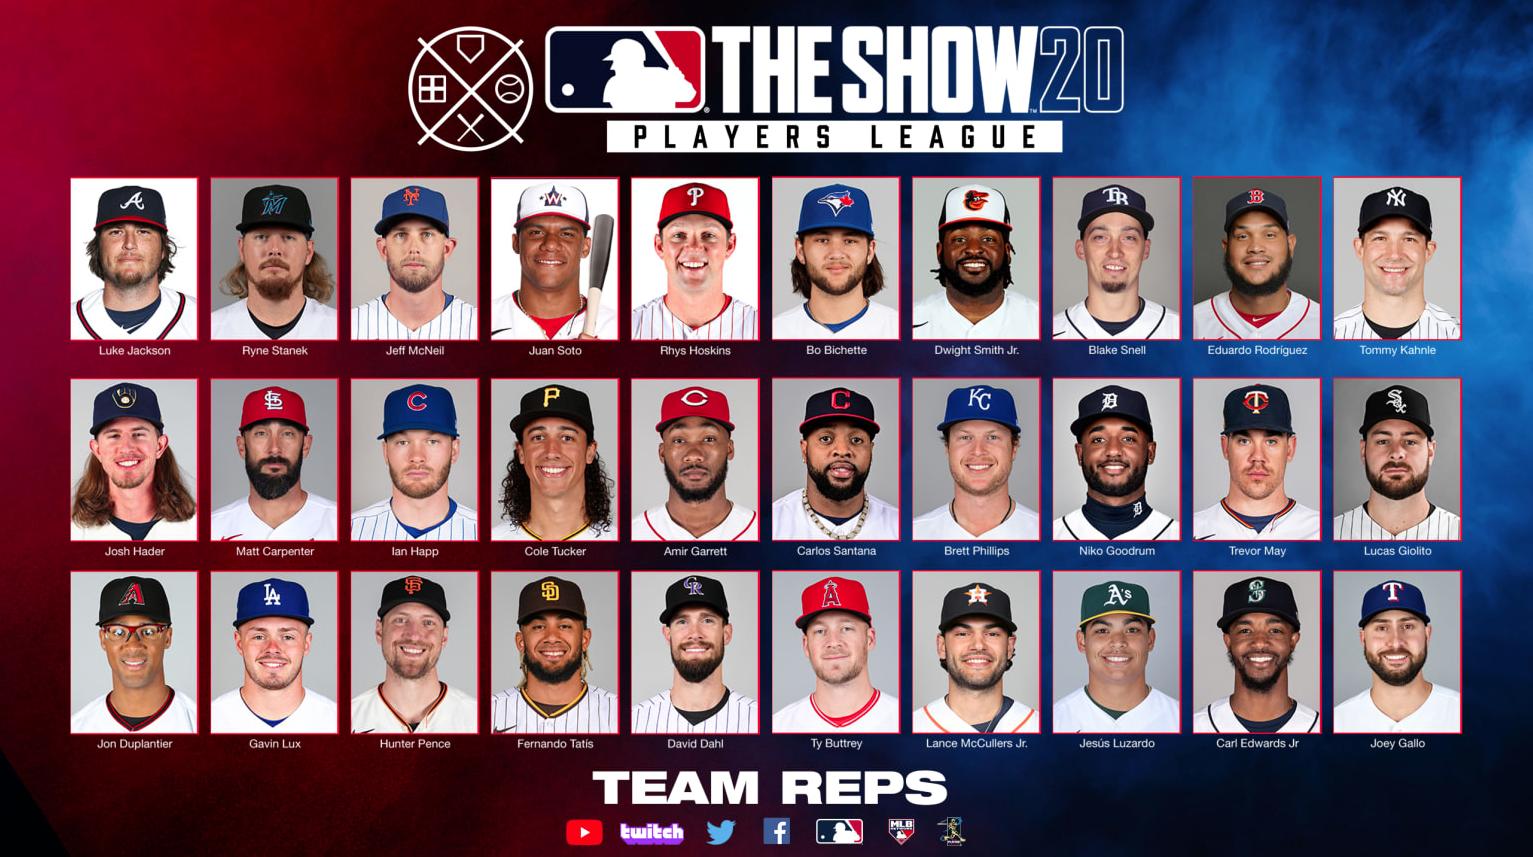 MLB The Show 20 baseball season announced